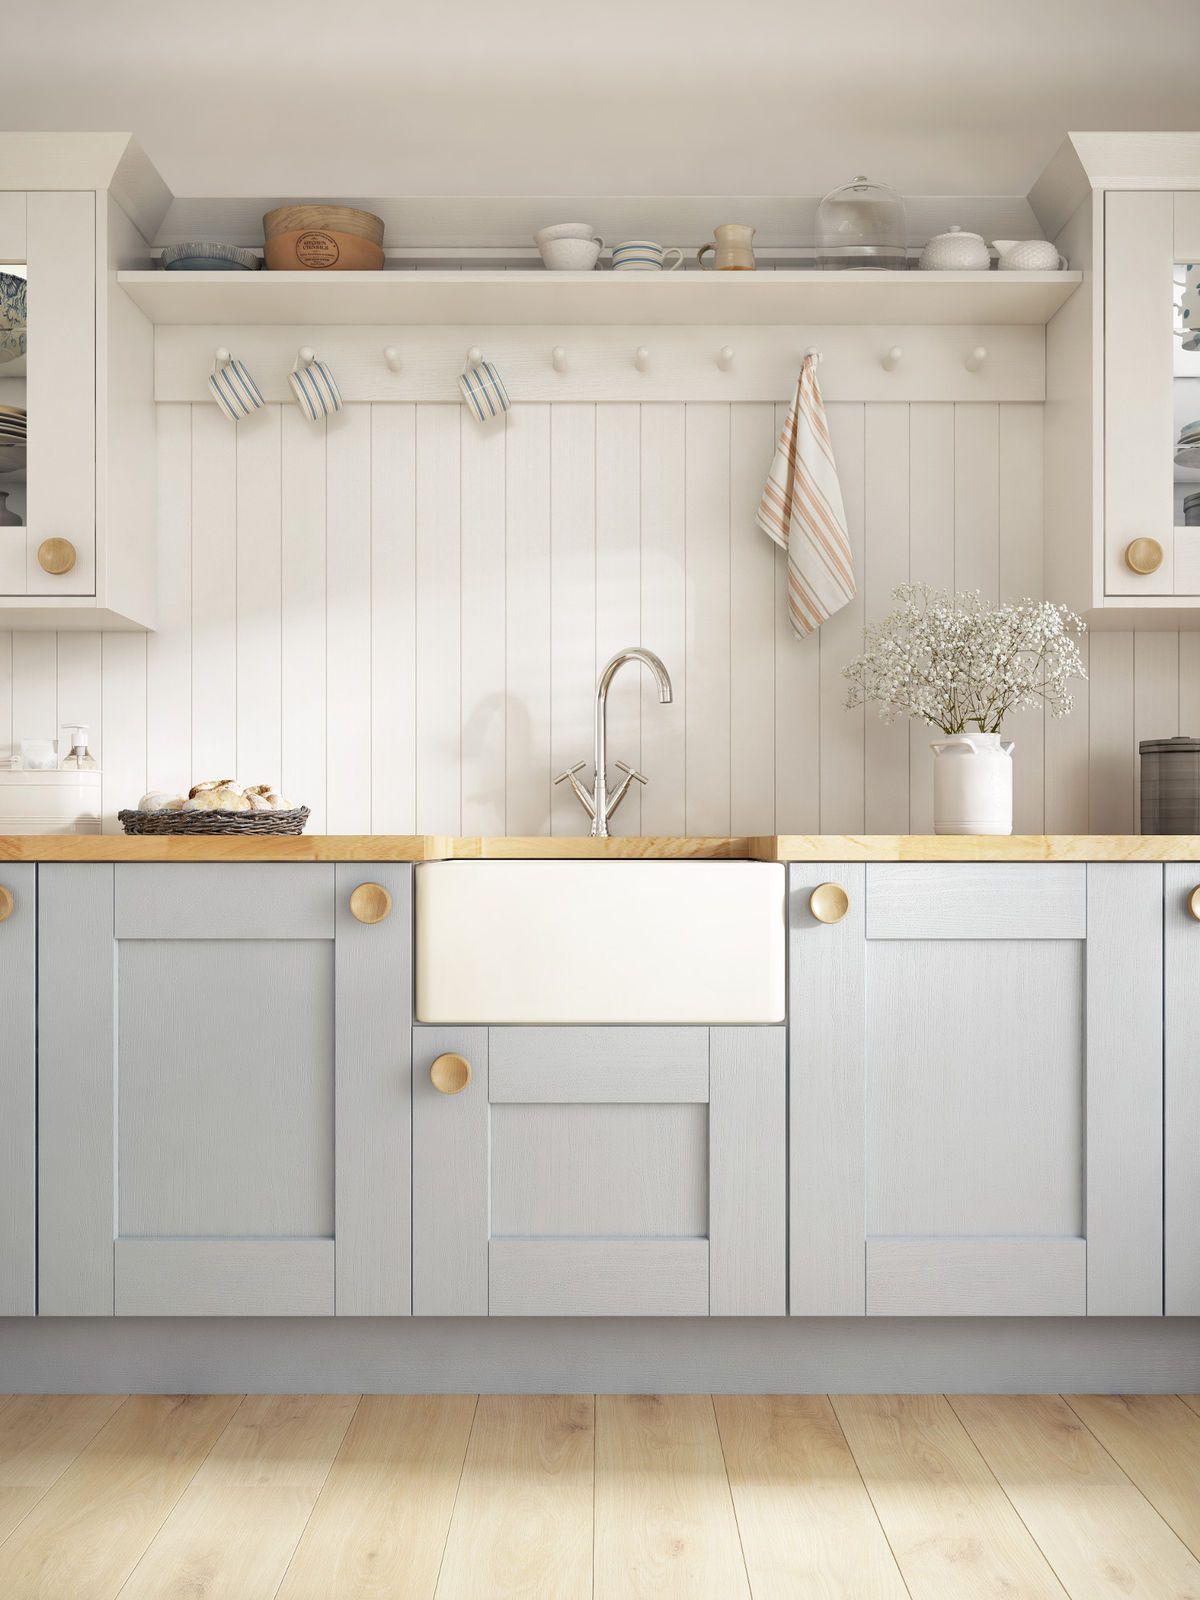 Fantastisch Klassische Küchen Inc Ideen - Küchen Ideen Modern ...